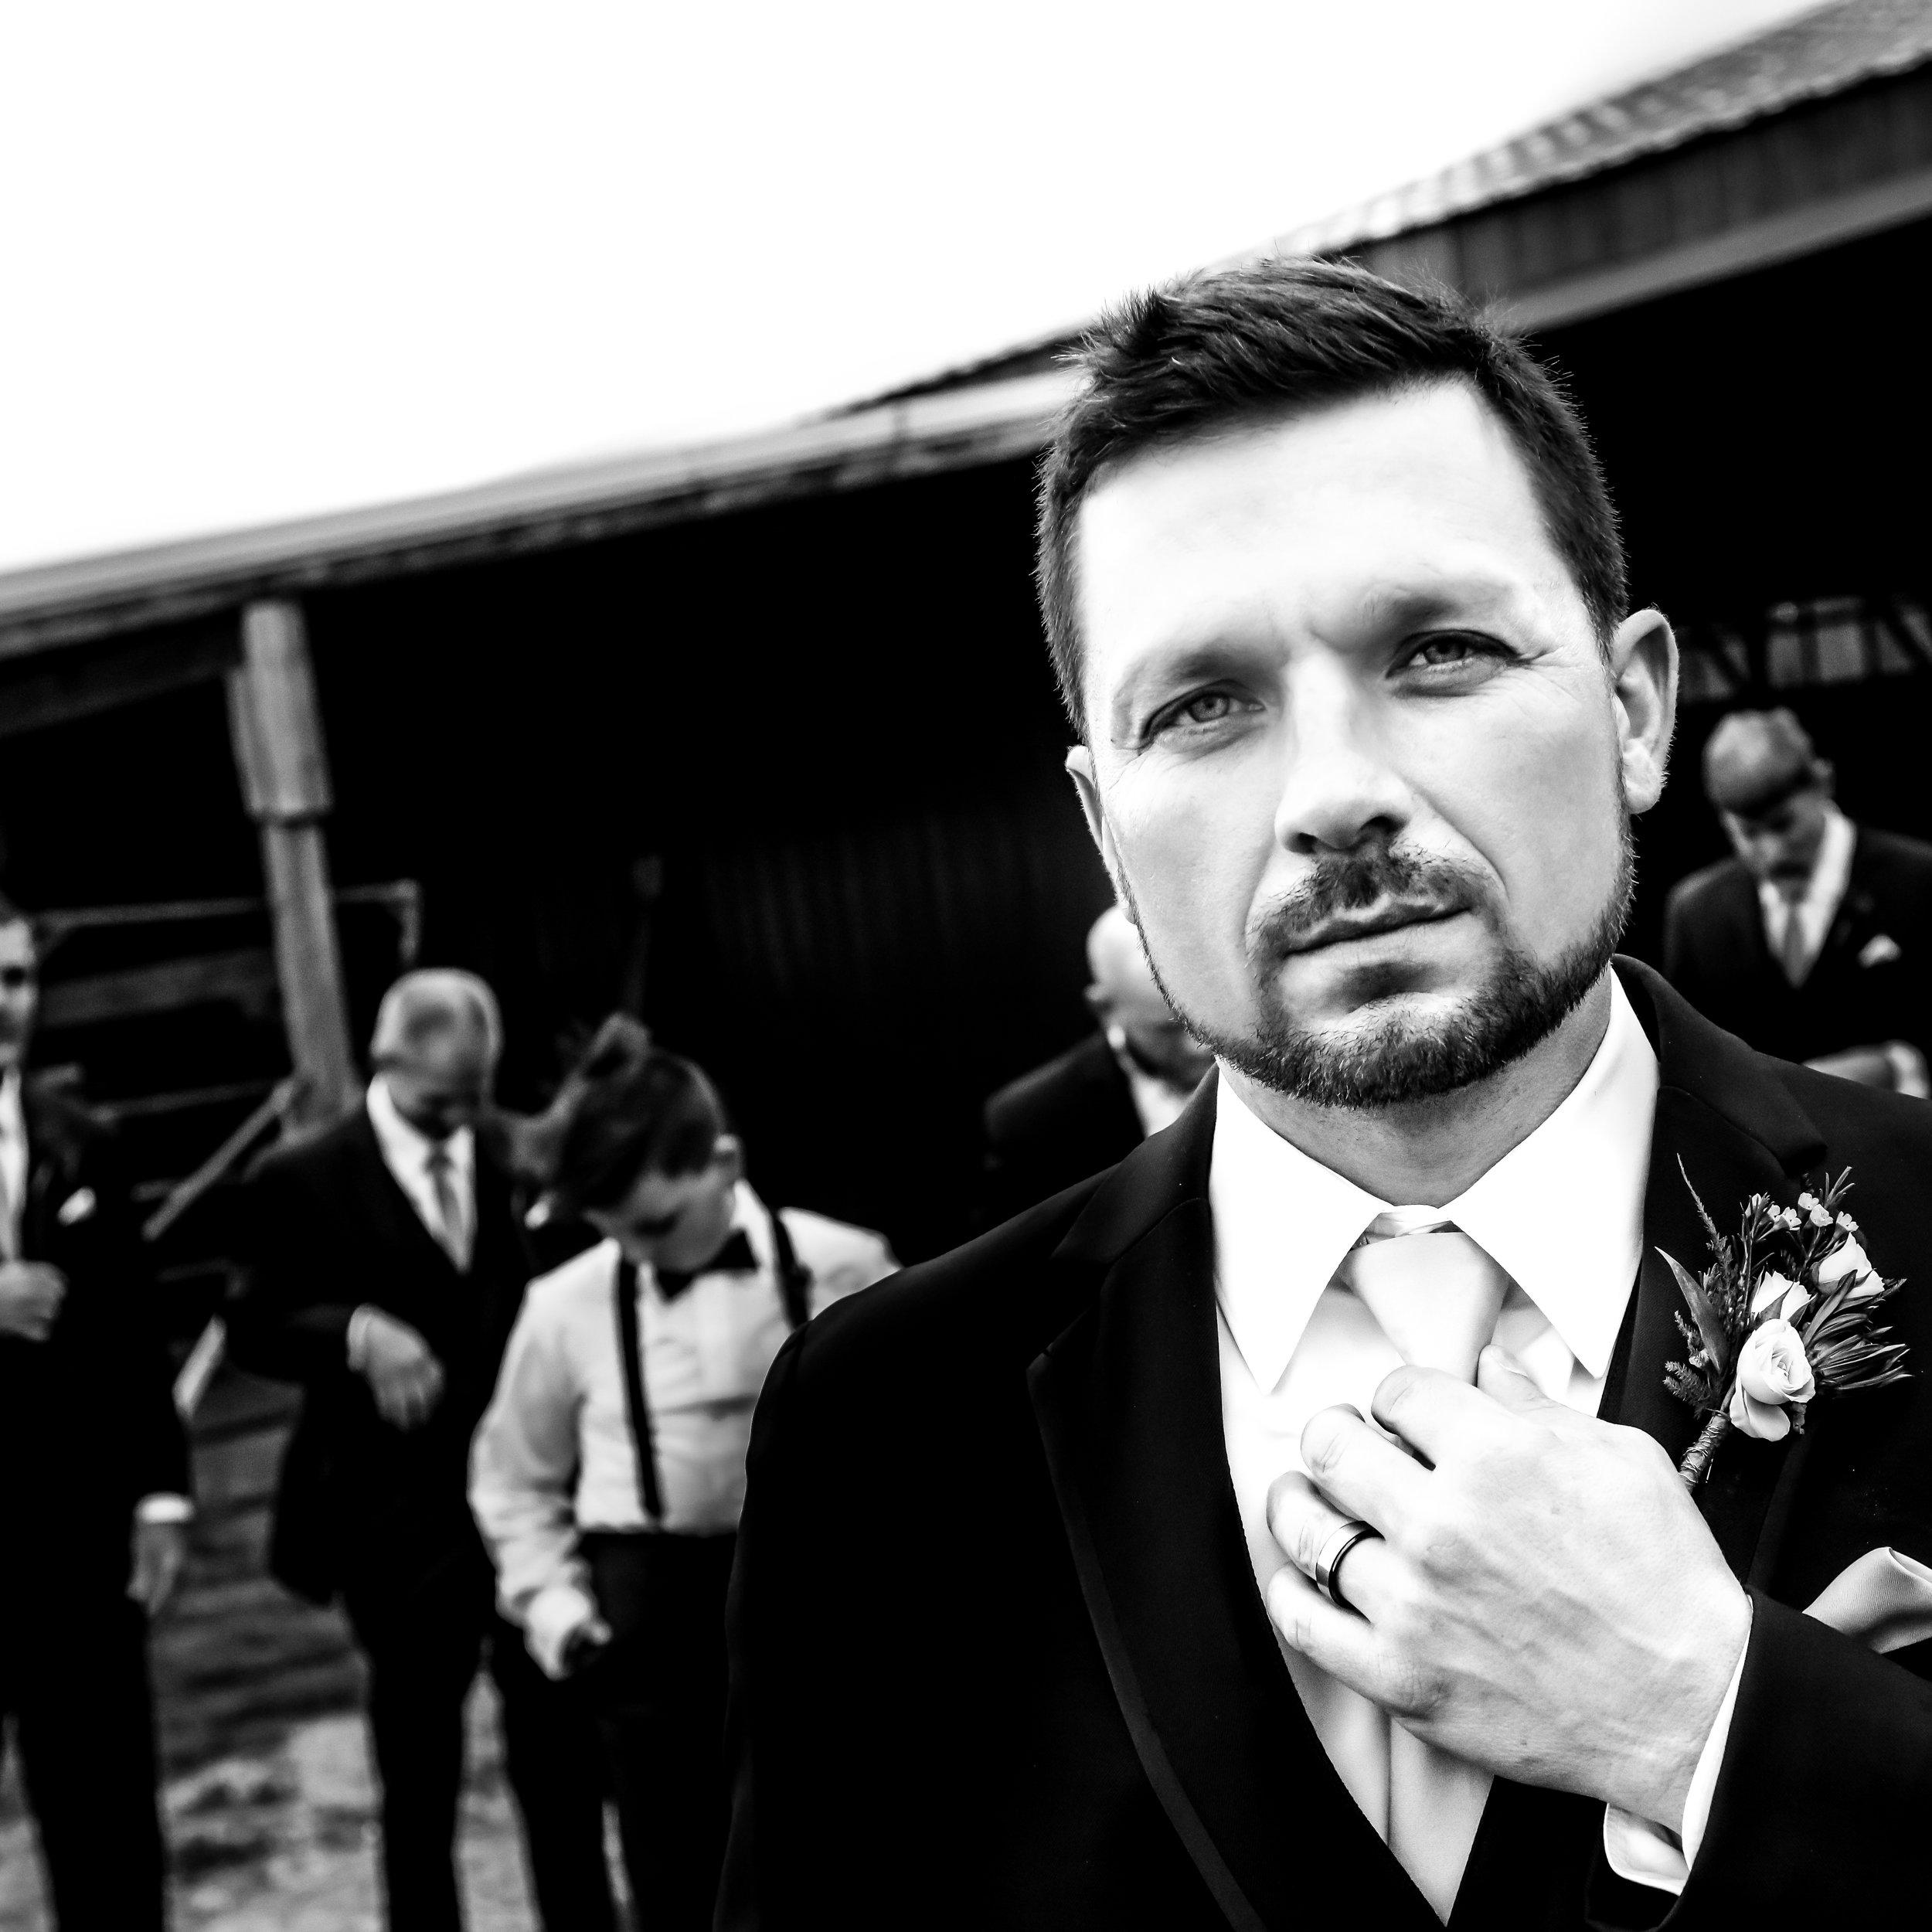 WeddingWebsite-64.jpg